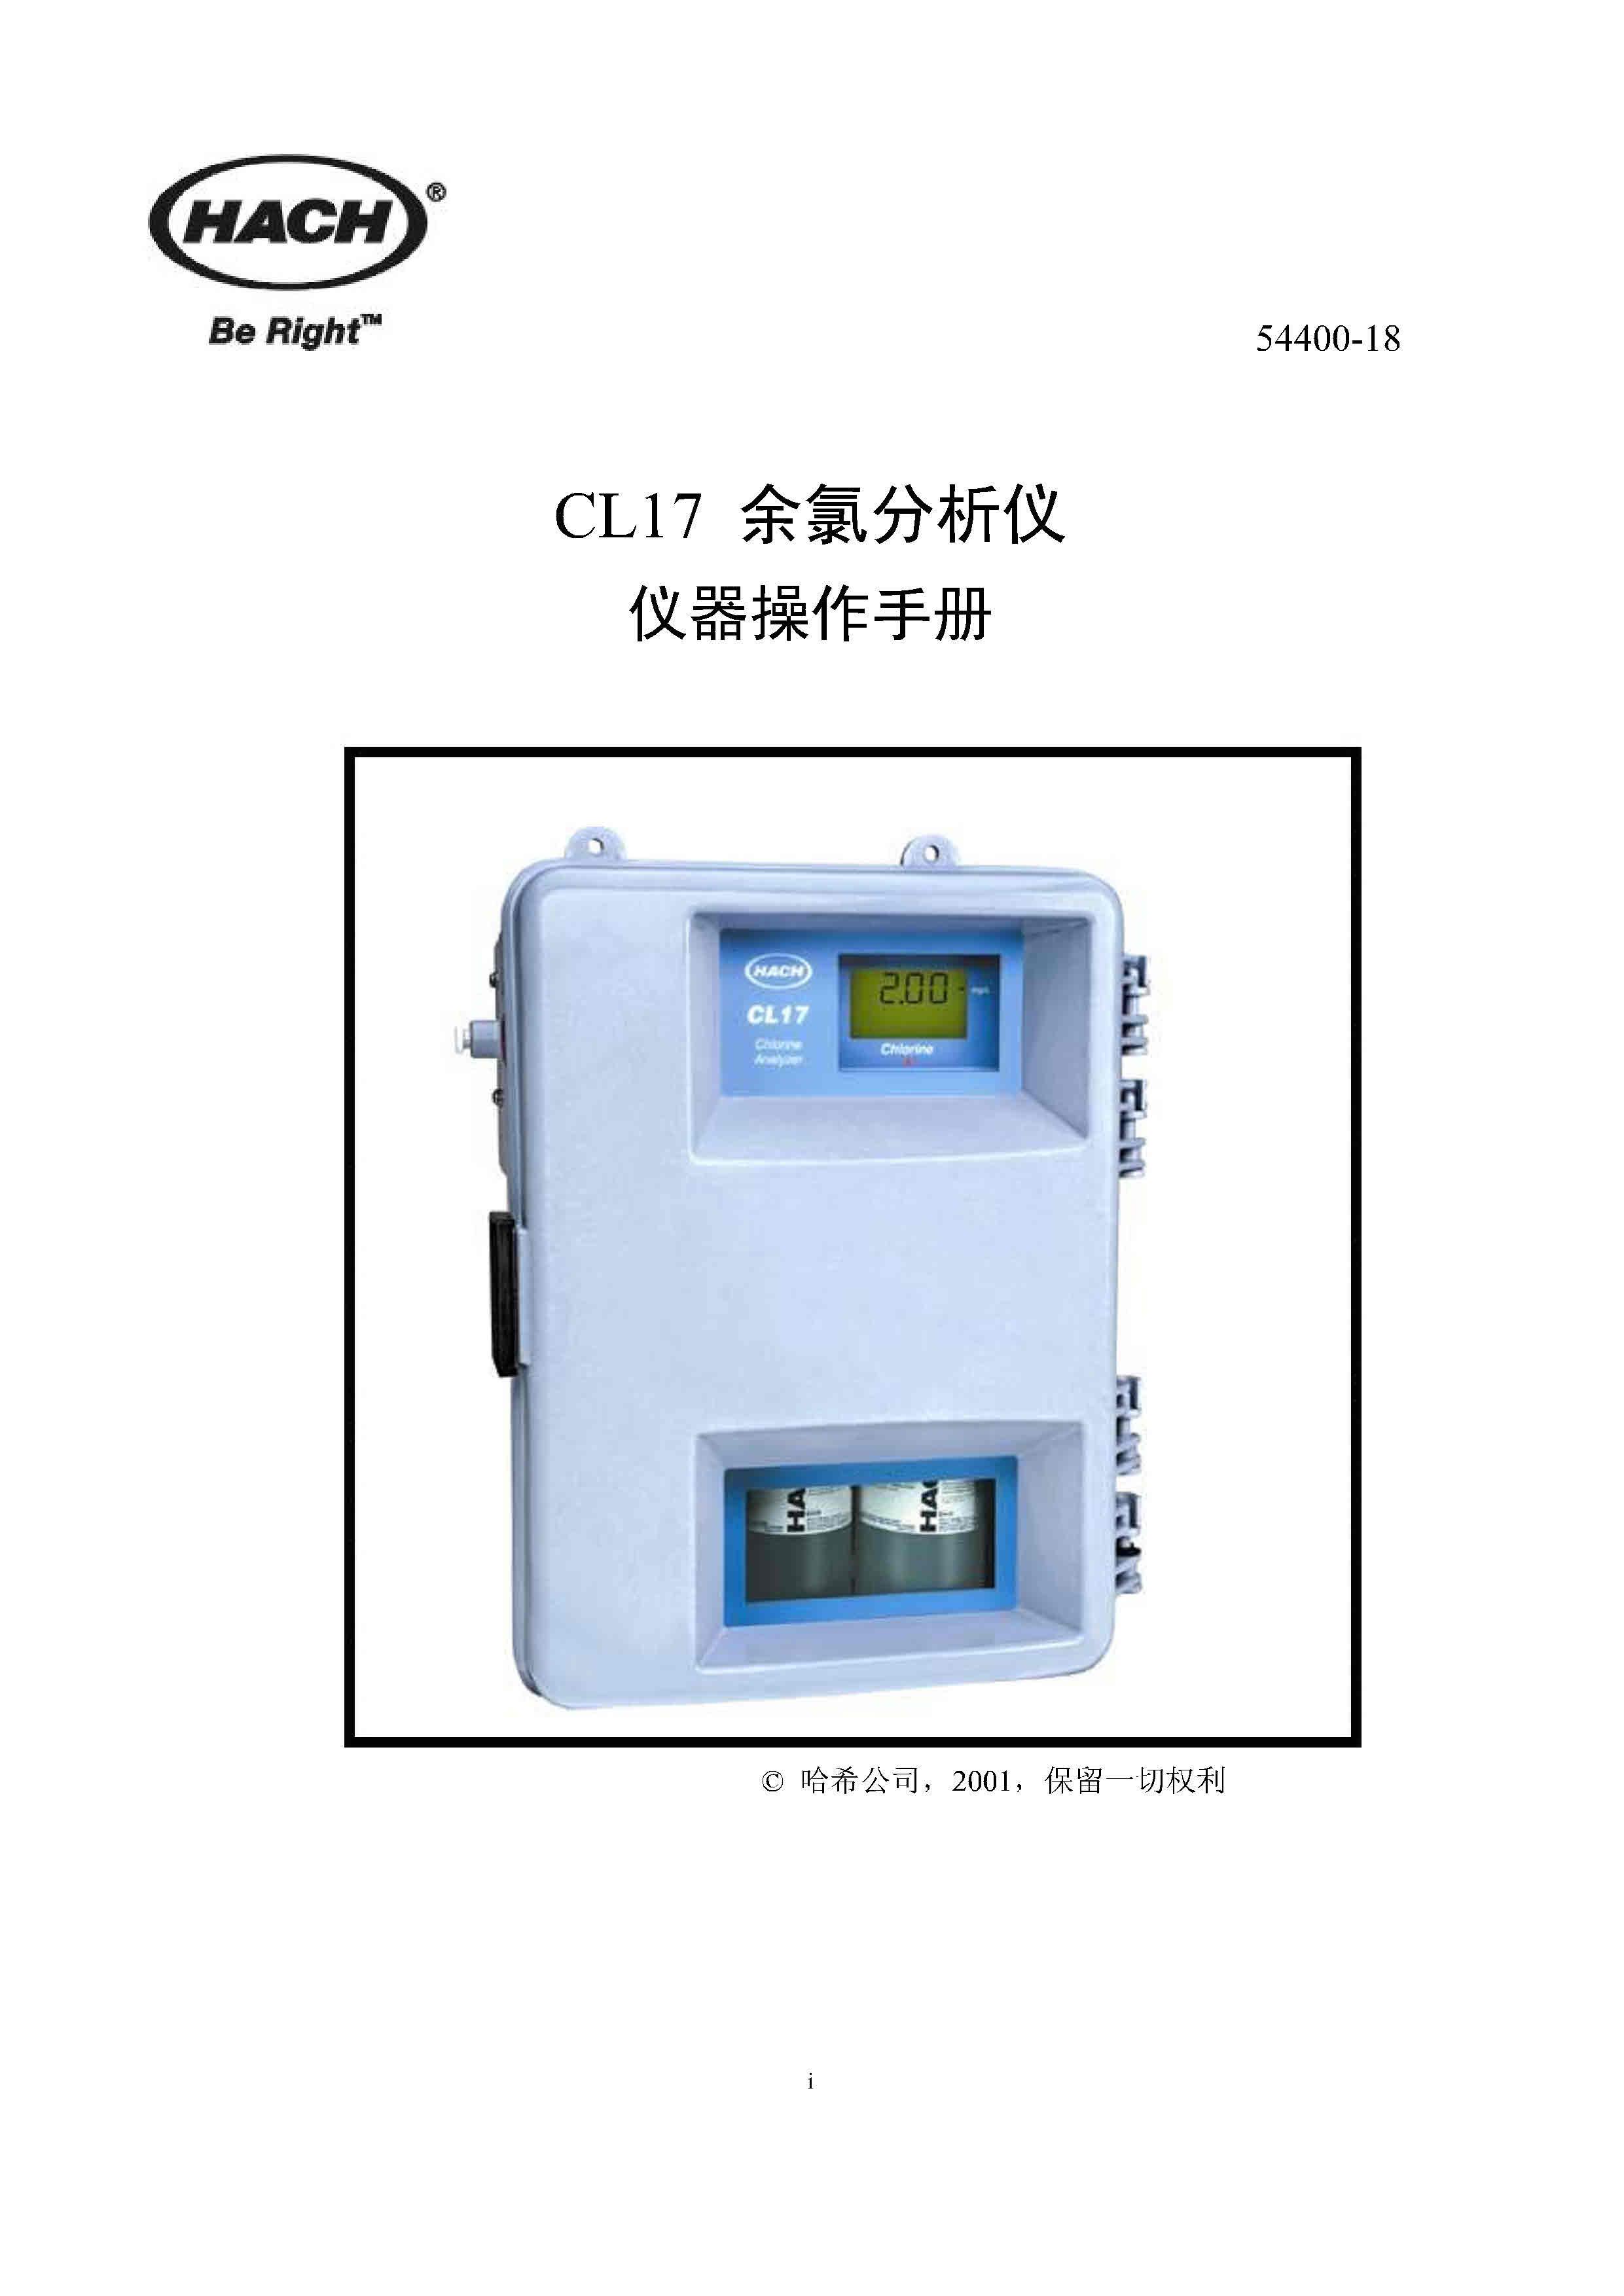 HACH哈希 CL17 余氯分析仪 仪器操作手册